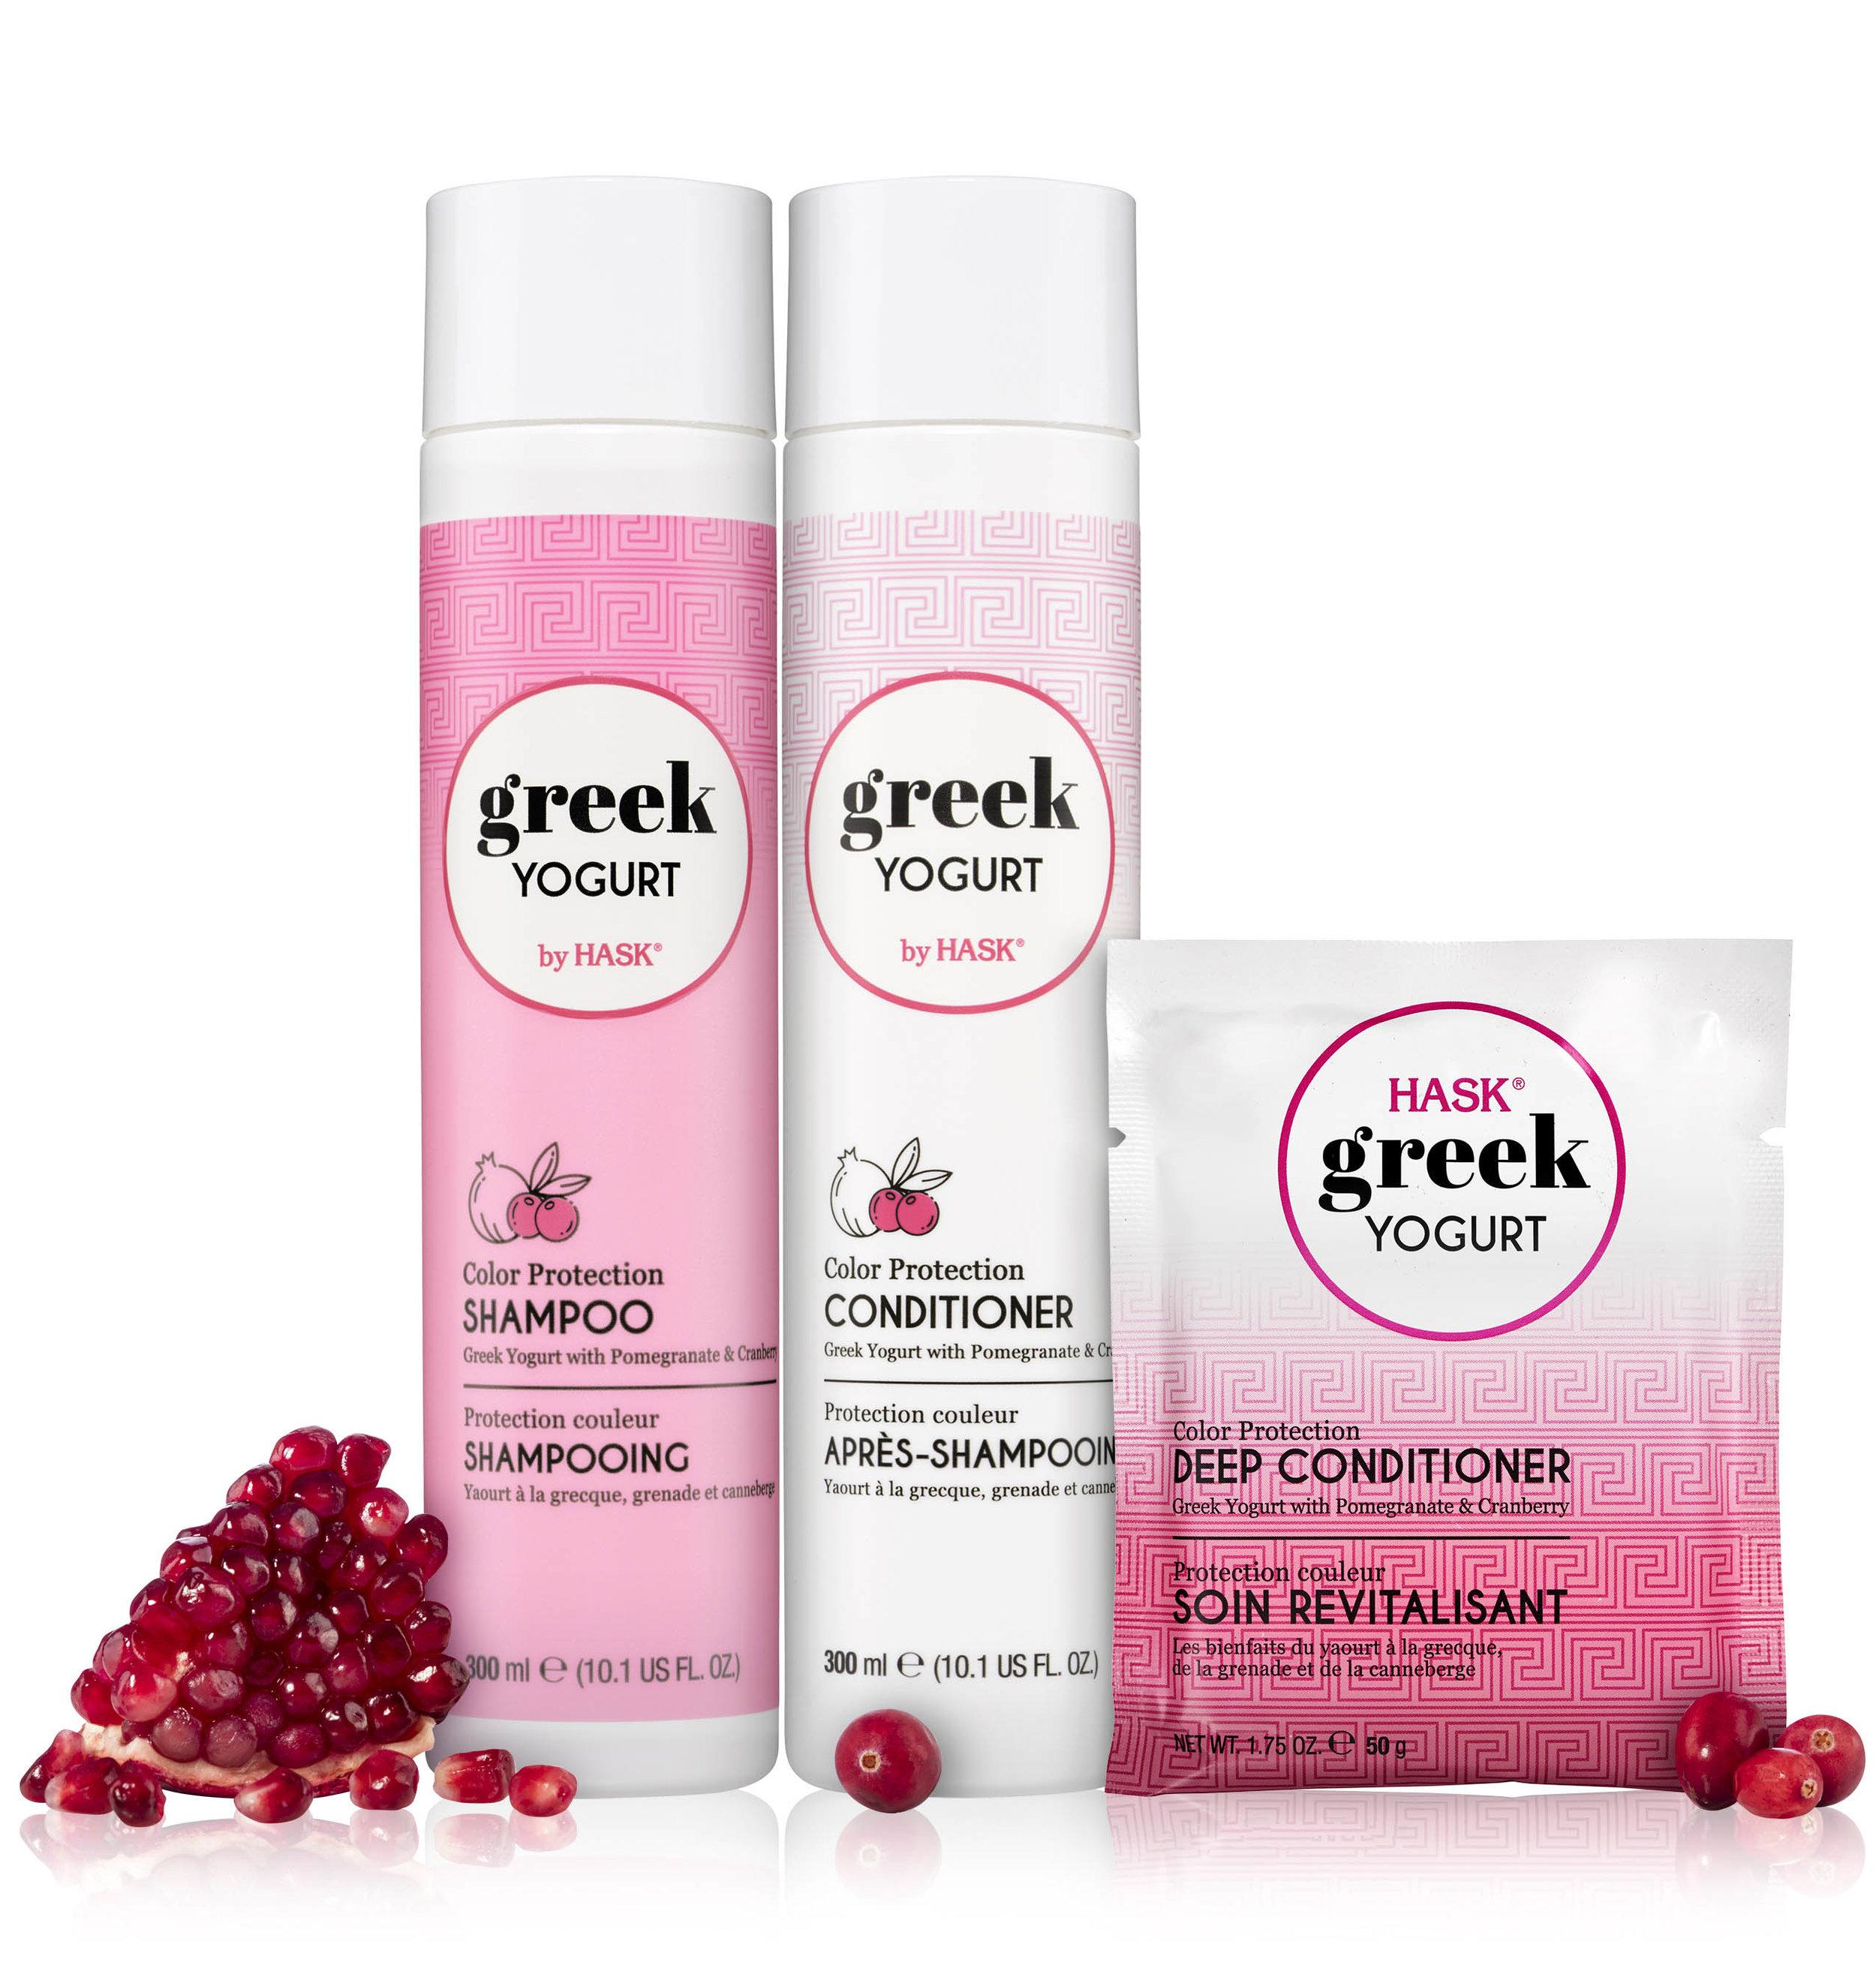 Greek_Yogurt_SS_Pomegranate_Cranberry_lineup_v2_low.jpg